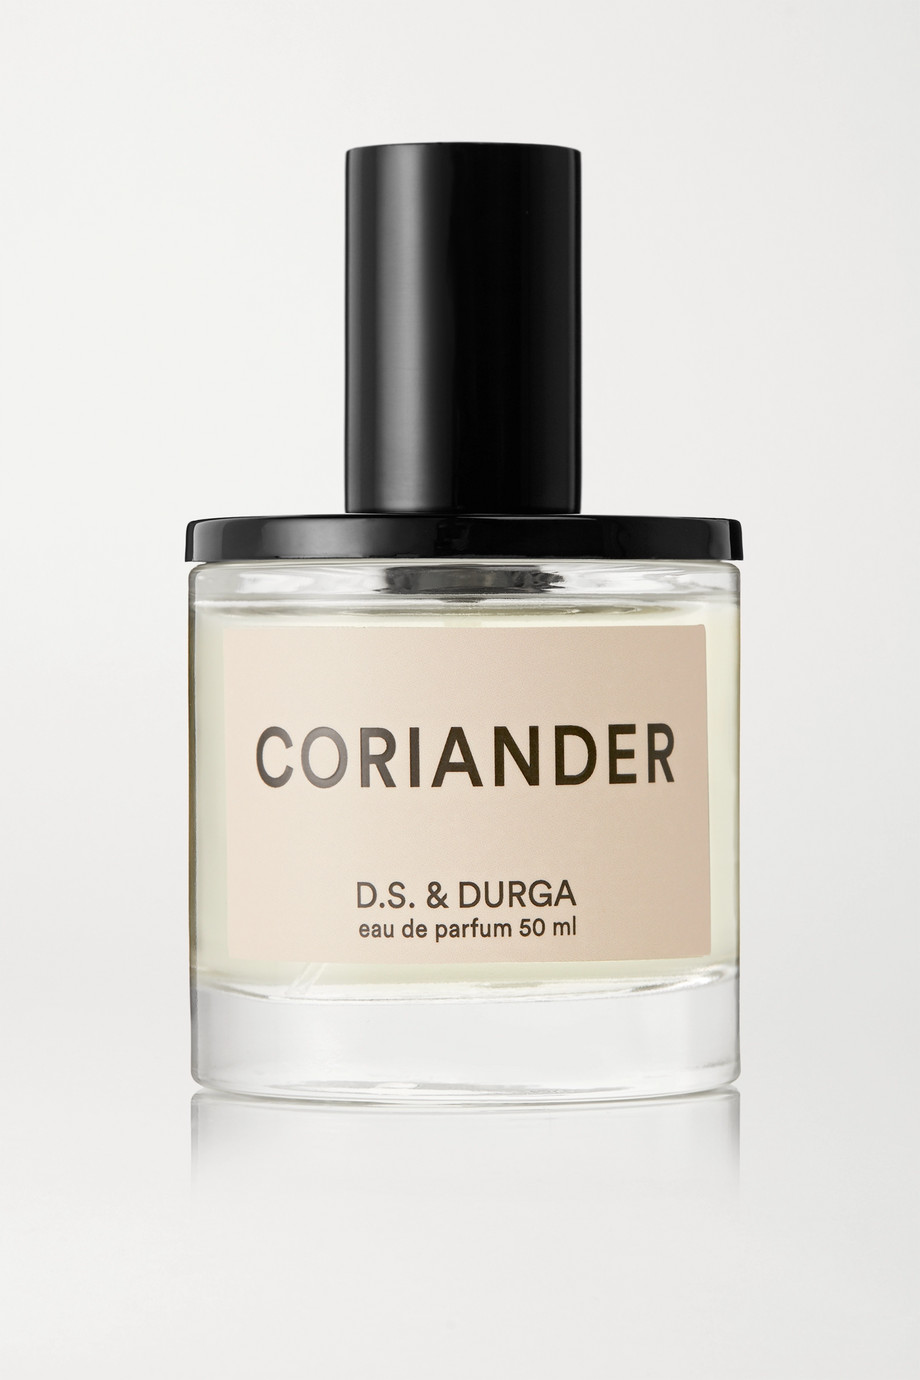 D.S. & Durga Eau de Parfum - Coriander, 50ml